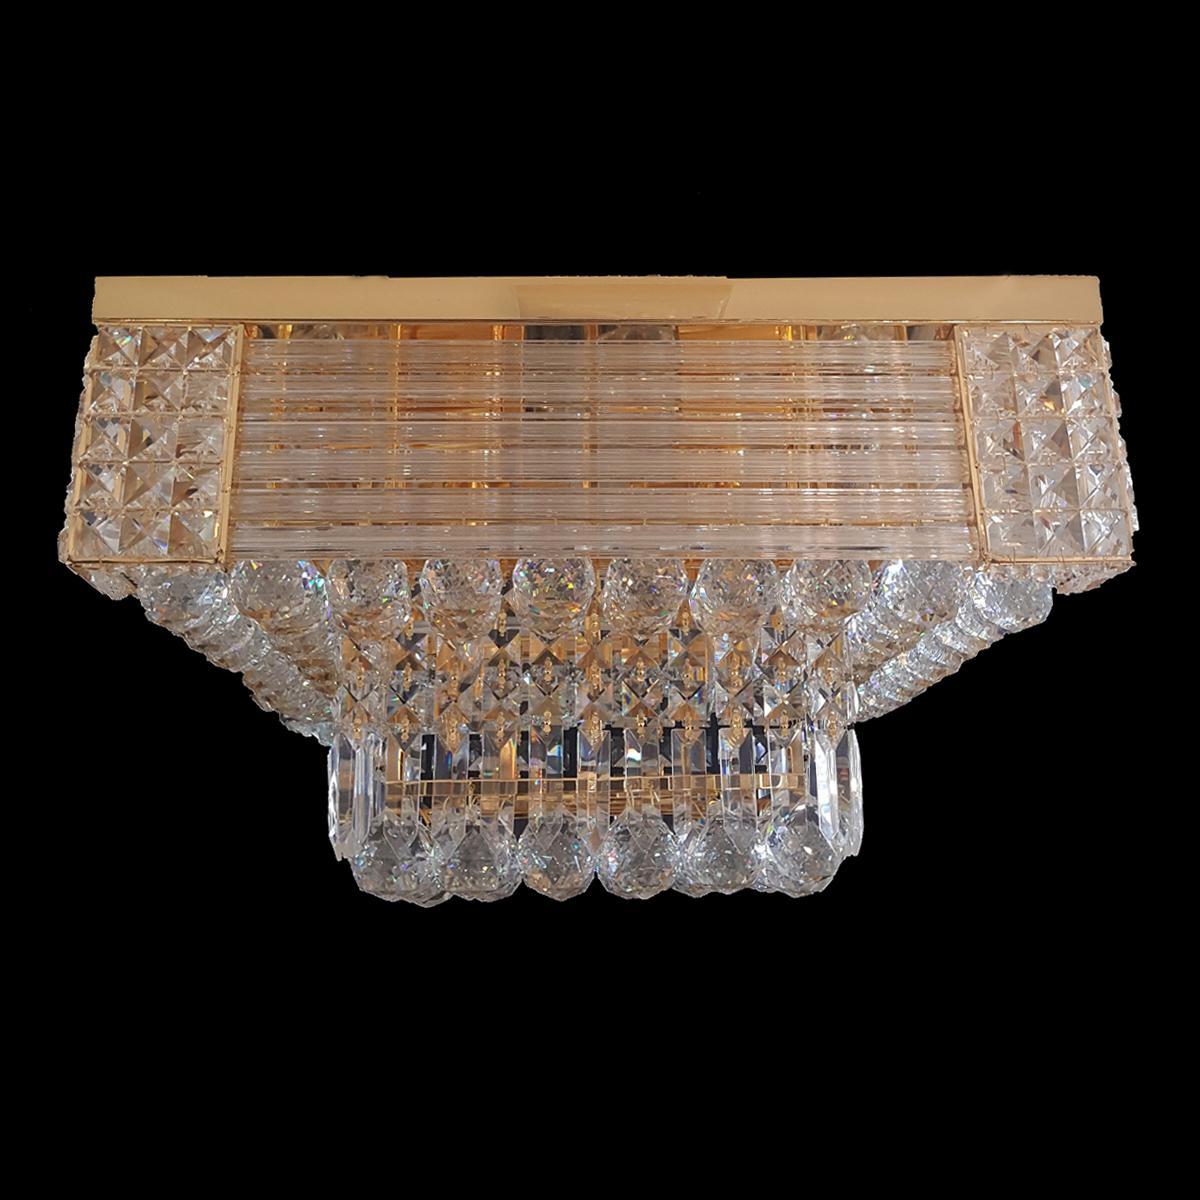 Midland 500 Gold Ceiling Light - CTCMID12500GD